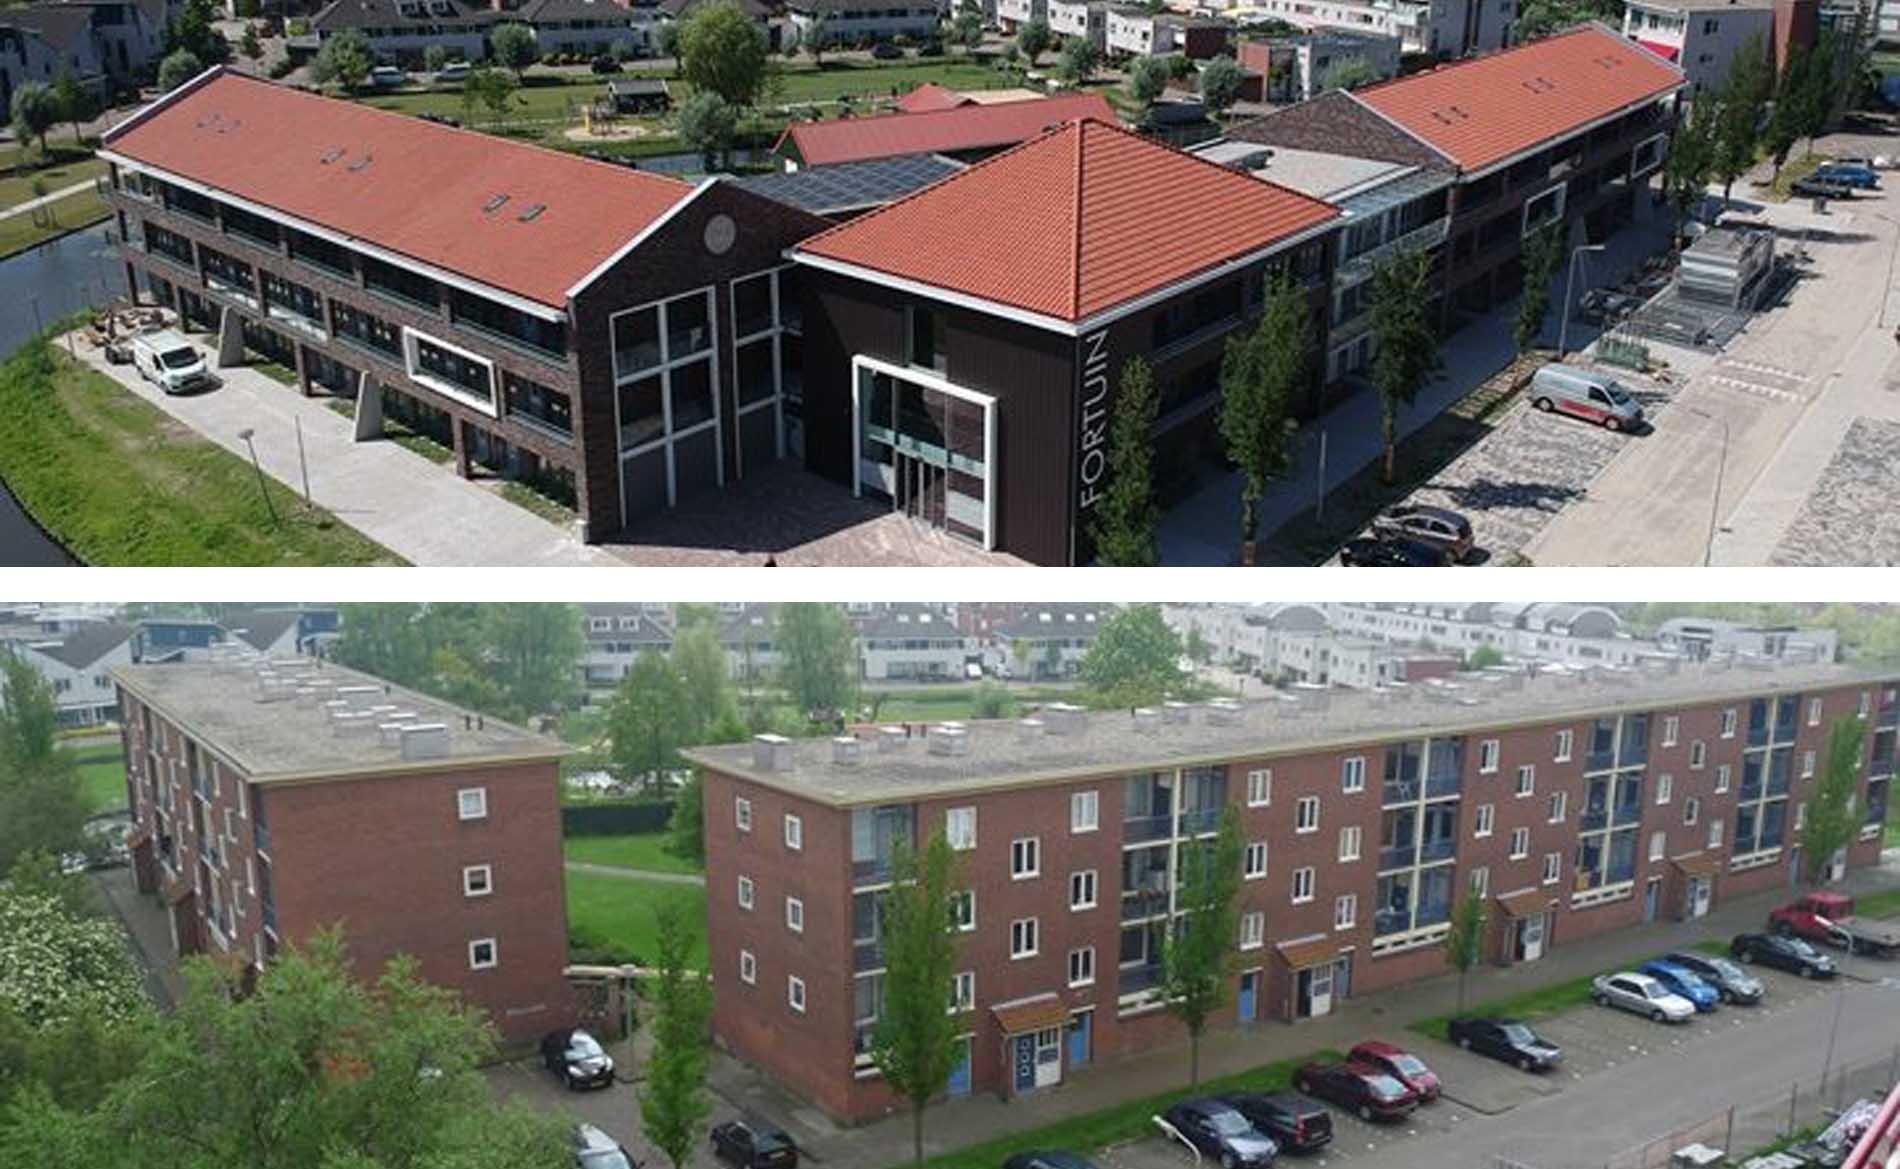 architect appartementen sociale woningbouw herstructurering Spatter- Fortuinstraat Wormer BBHD architecten